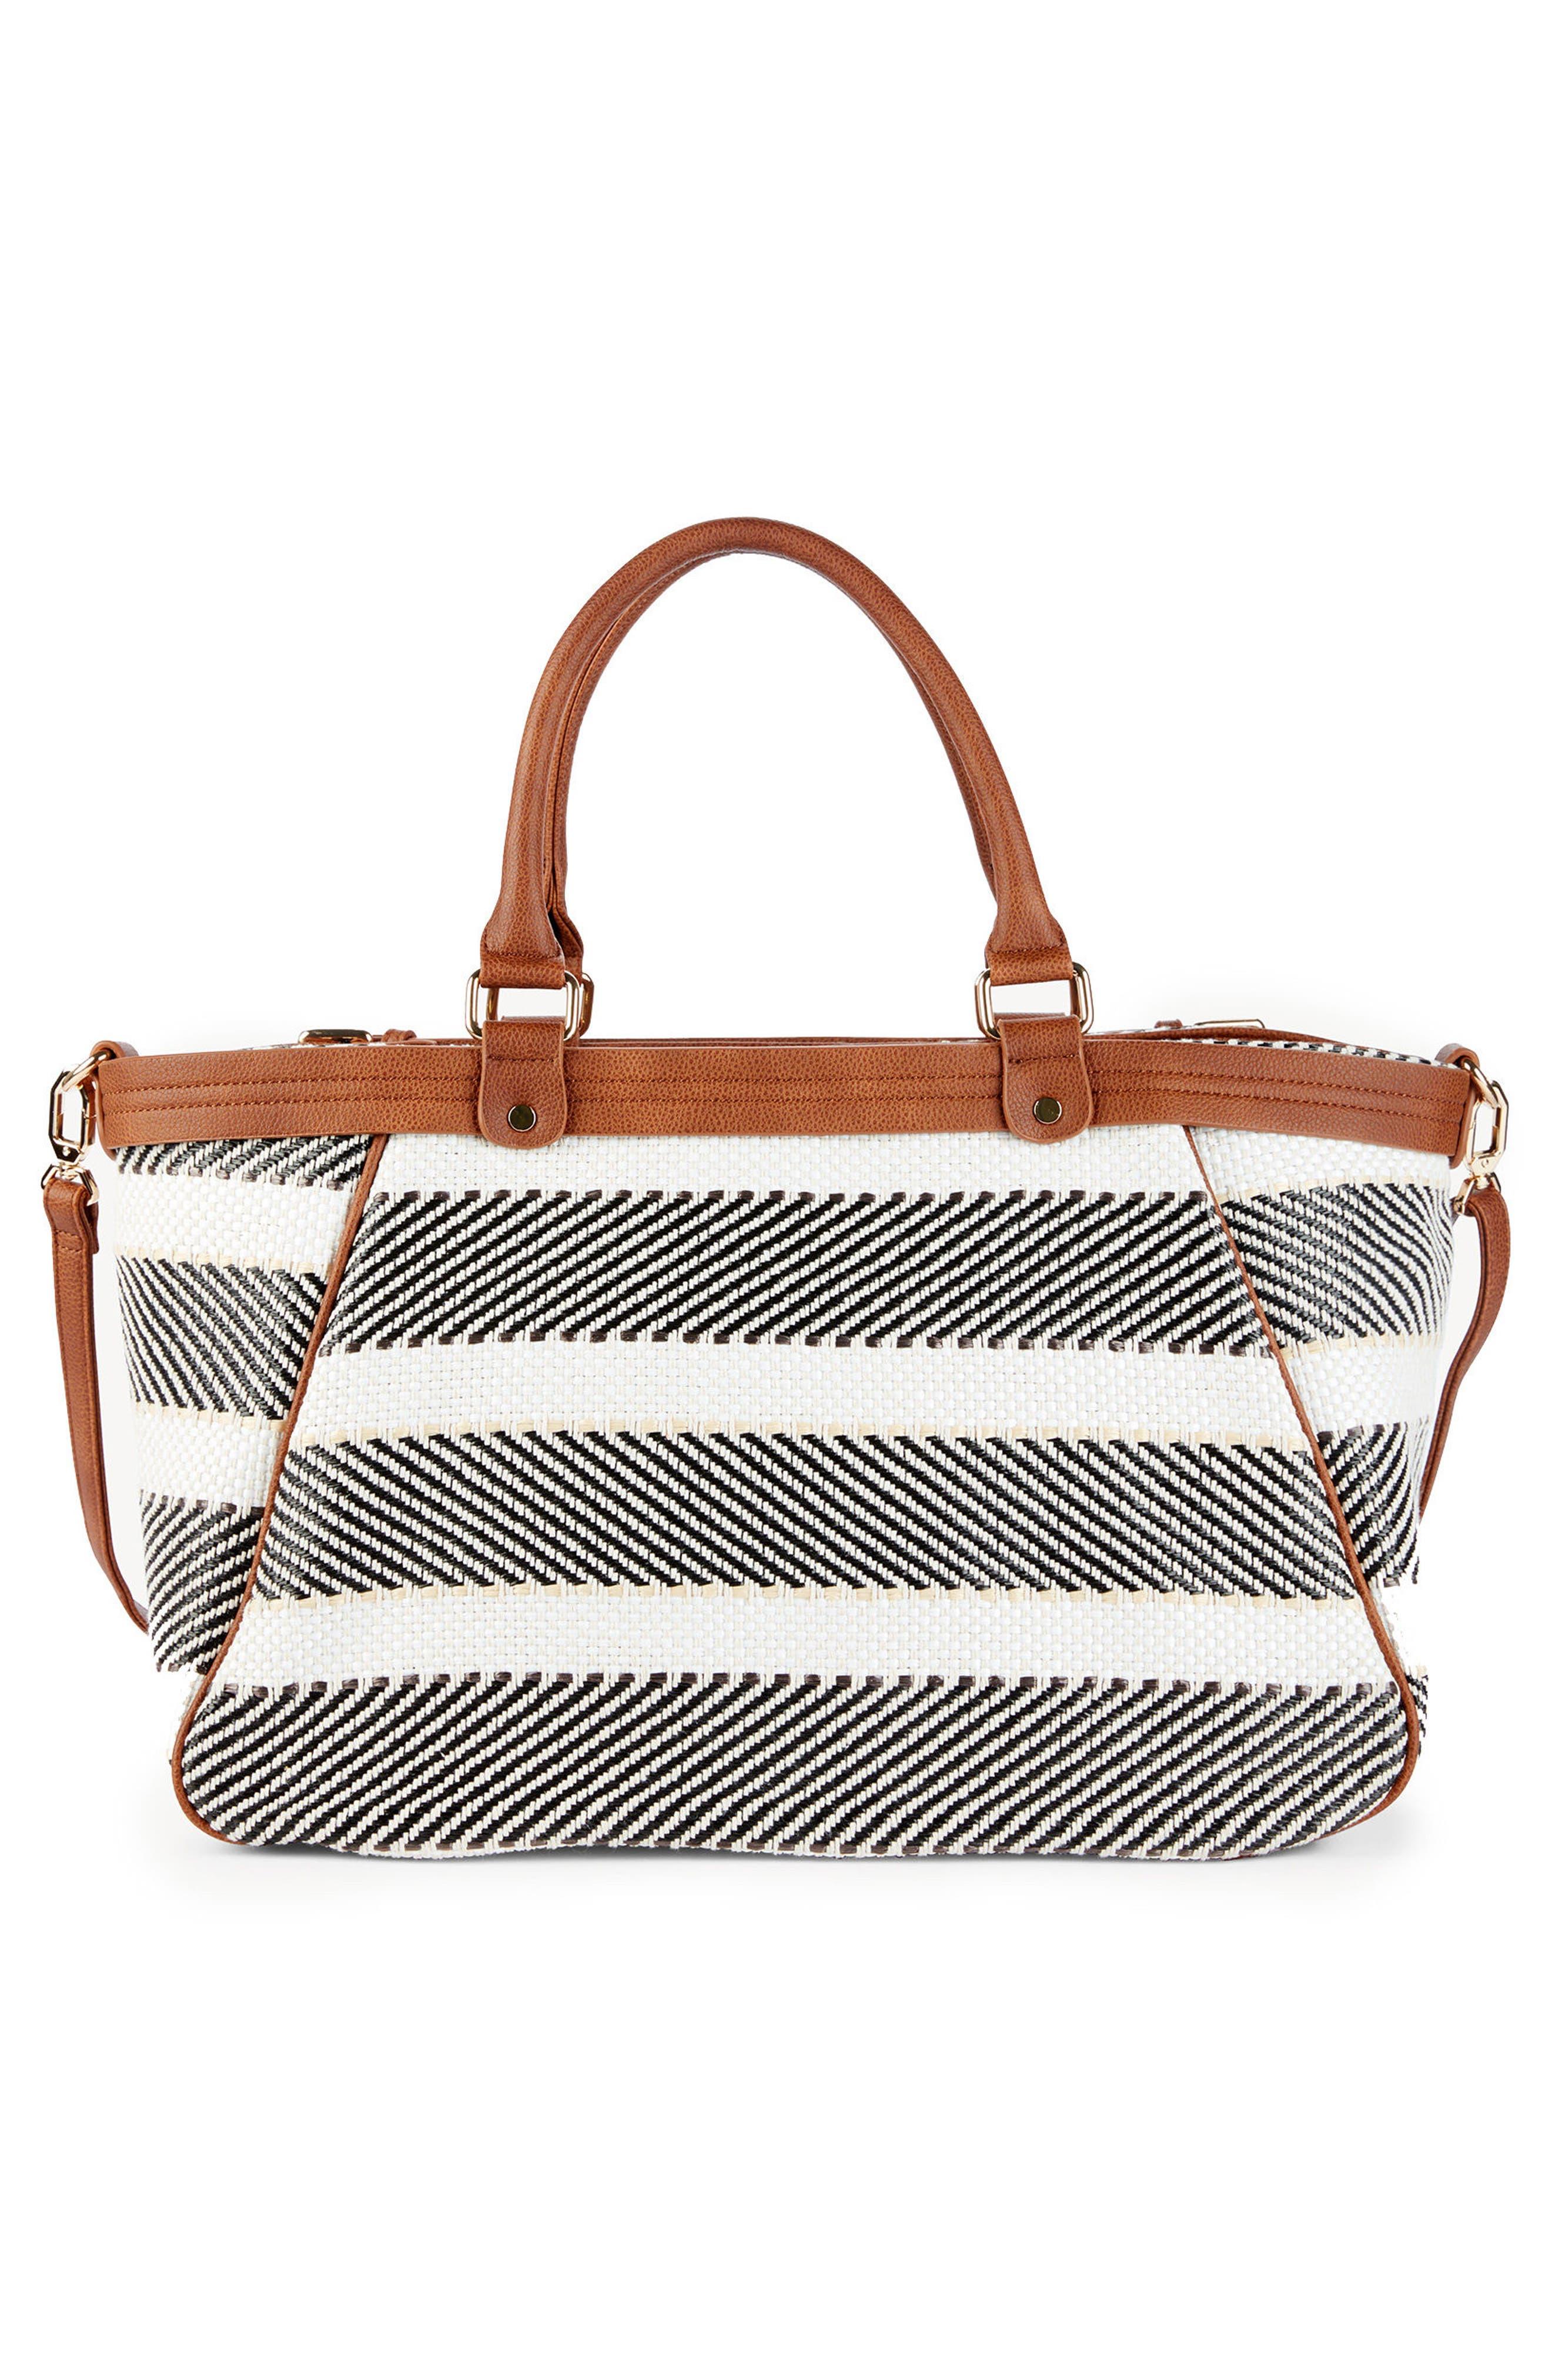 Stripe Woven Weekend Bag,                             Alternate thumbnail 3, color,                             Black/ Cream Combo